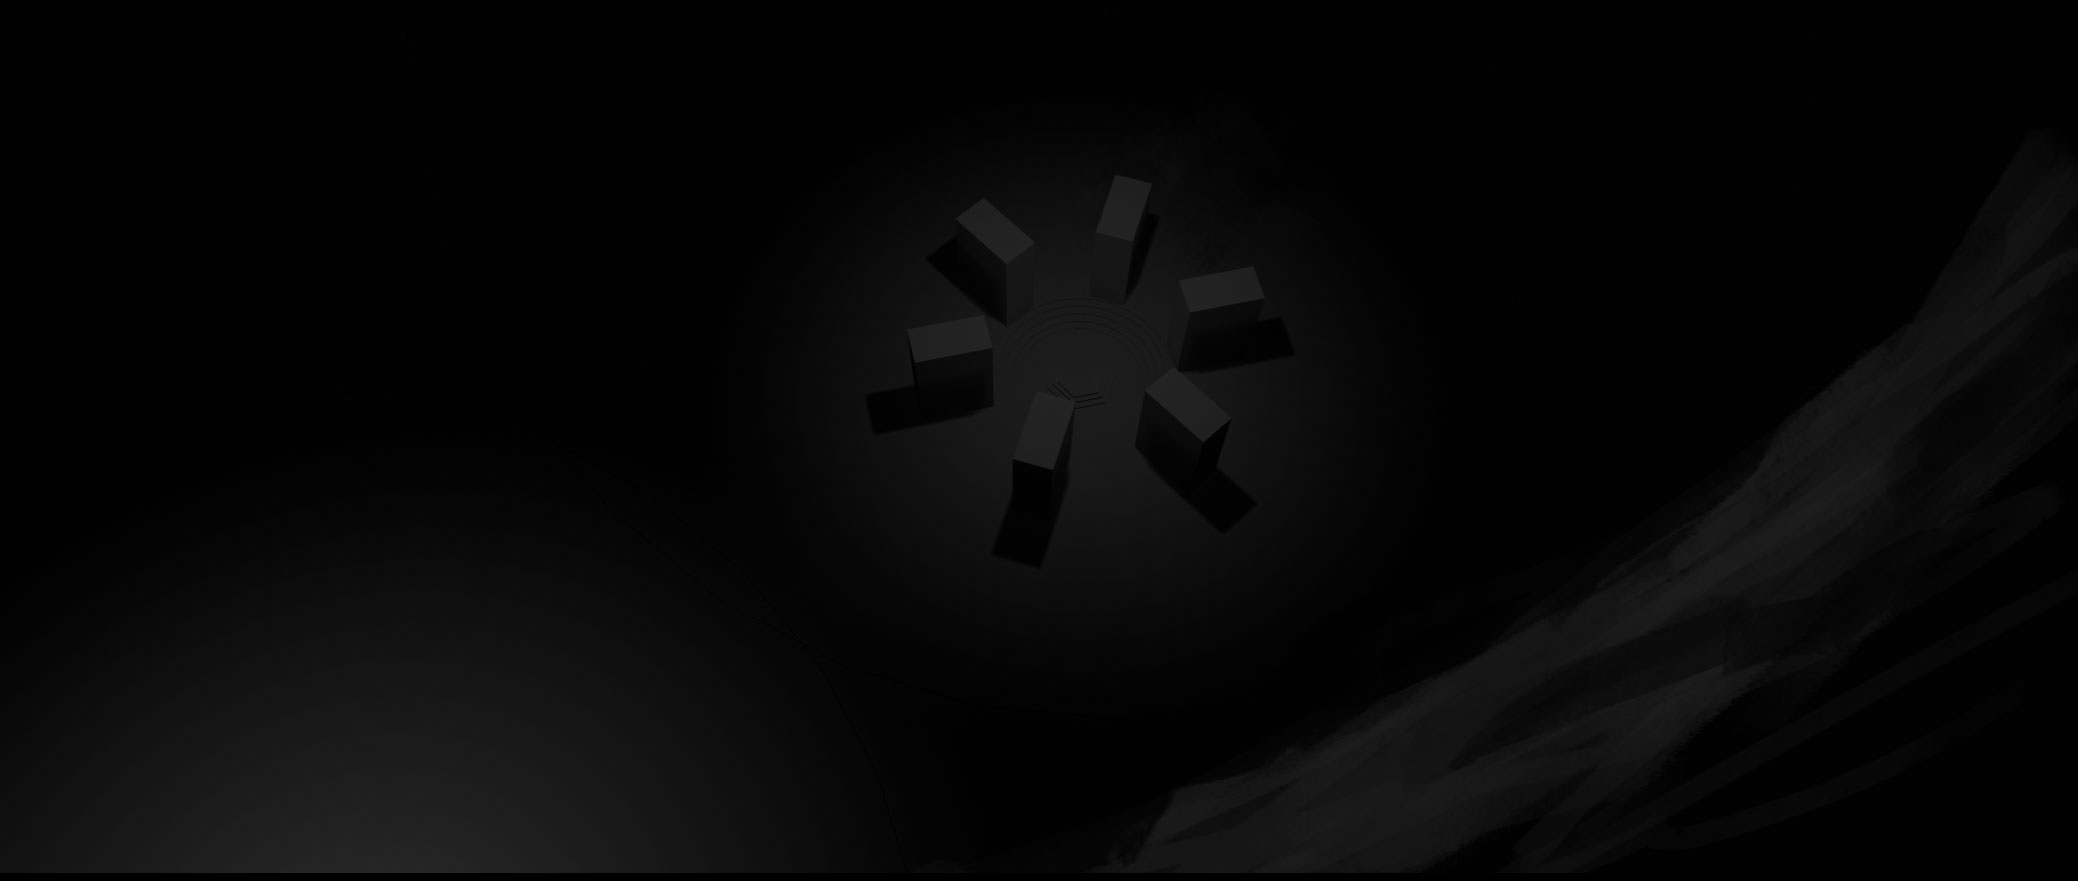 Wraiths_2019Animatic_Thumbsheet-02_112.jpg